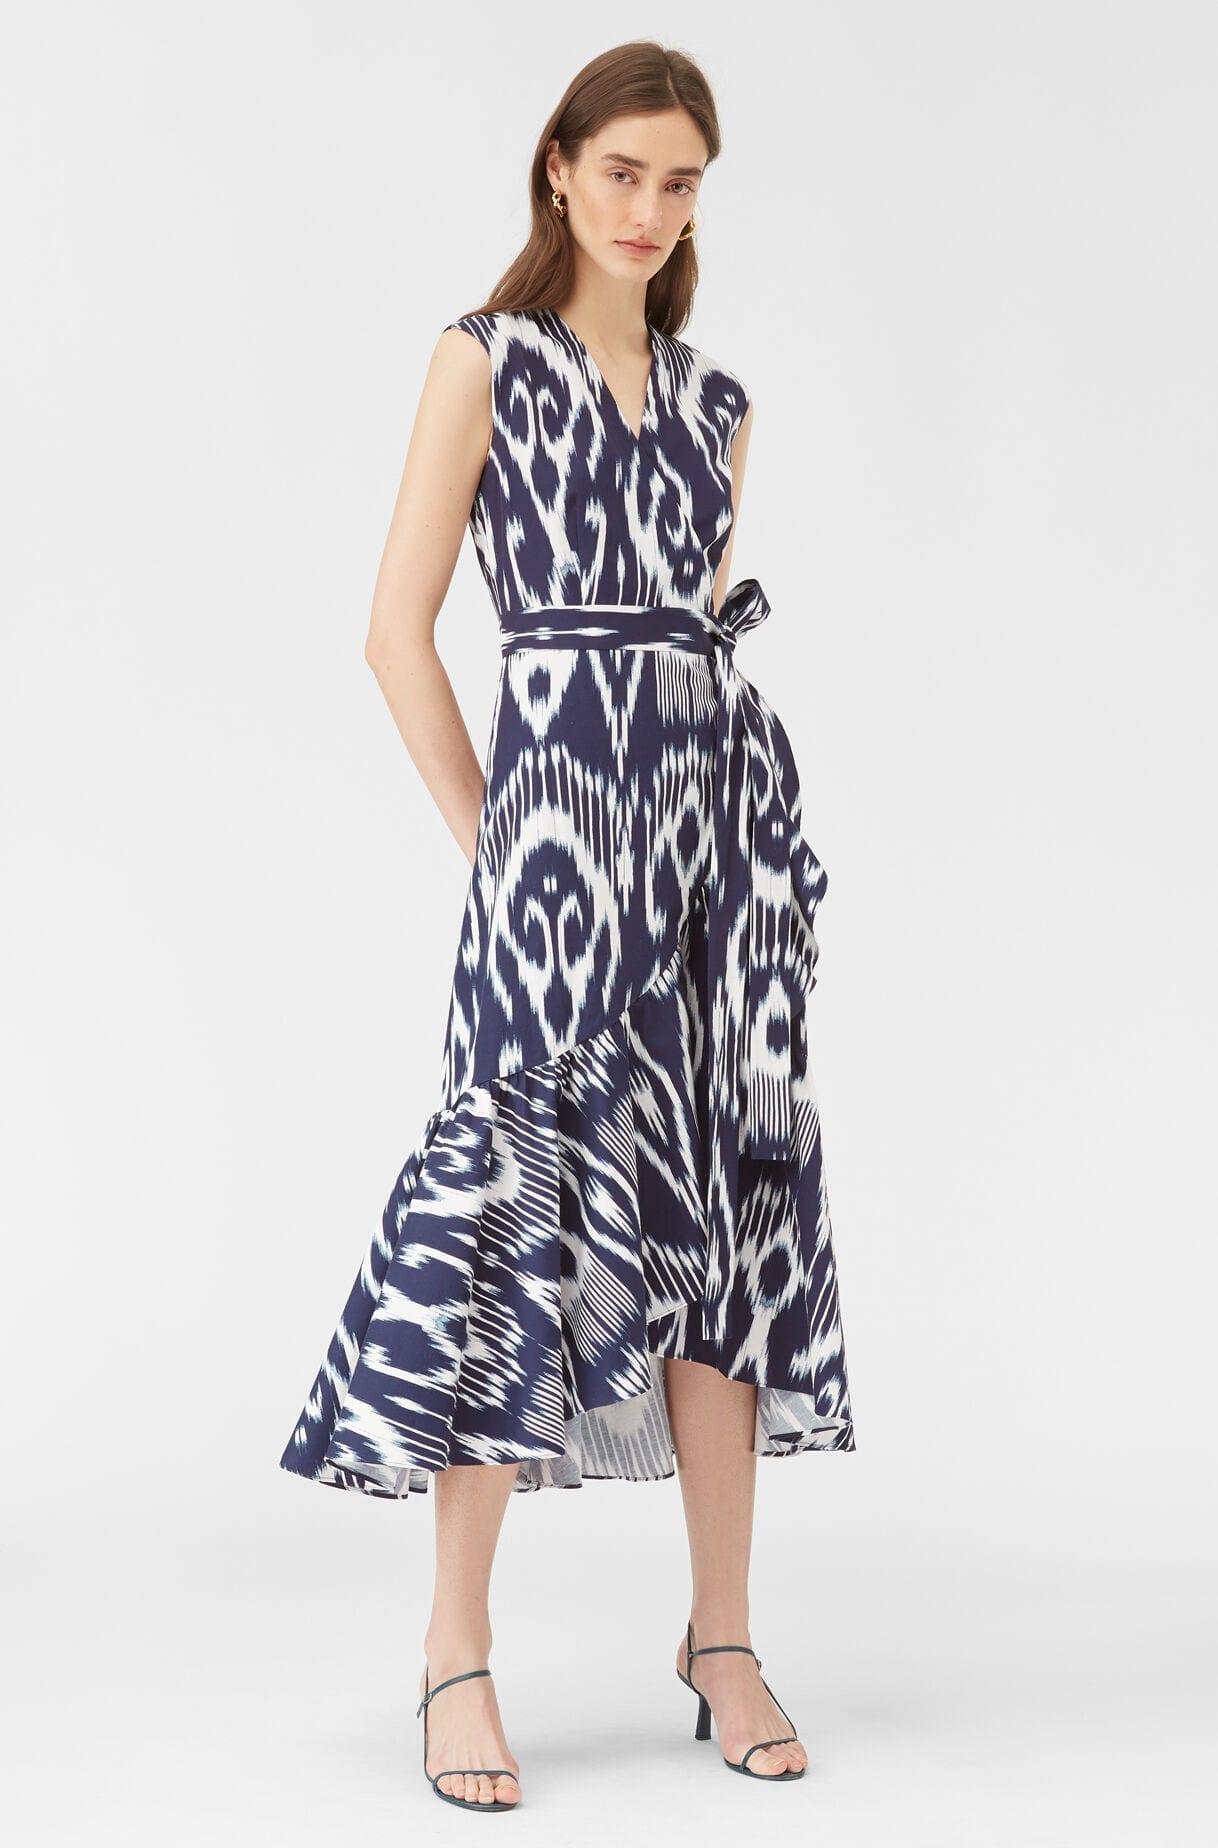 REBECCA TAYLOR Indigo Ikat Wrap Dress